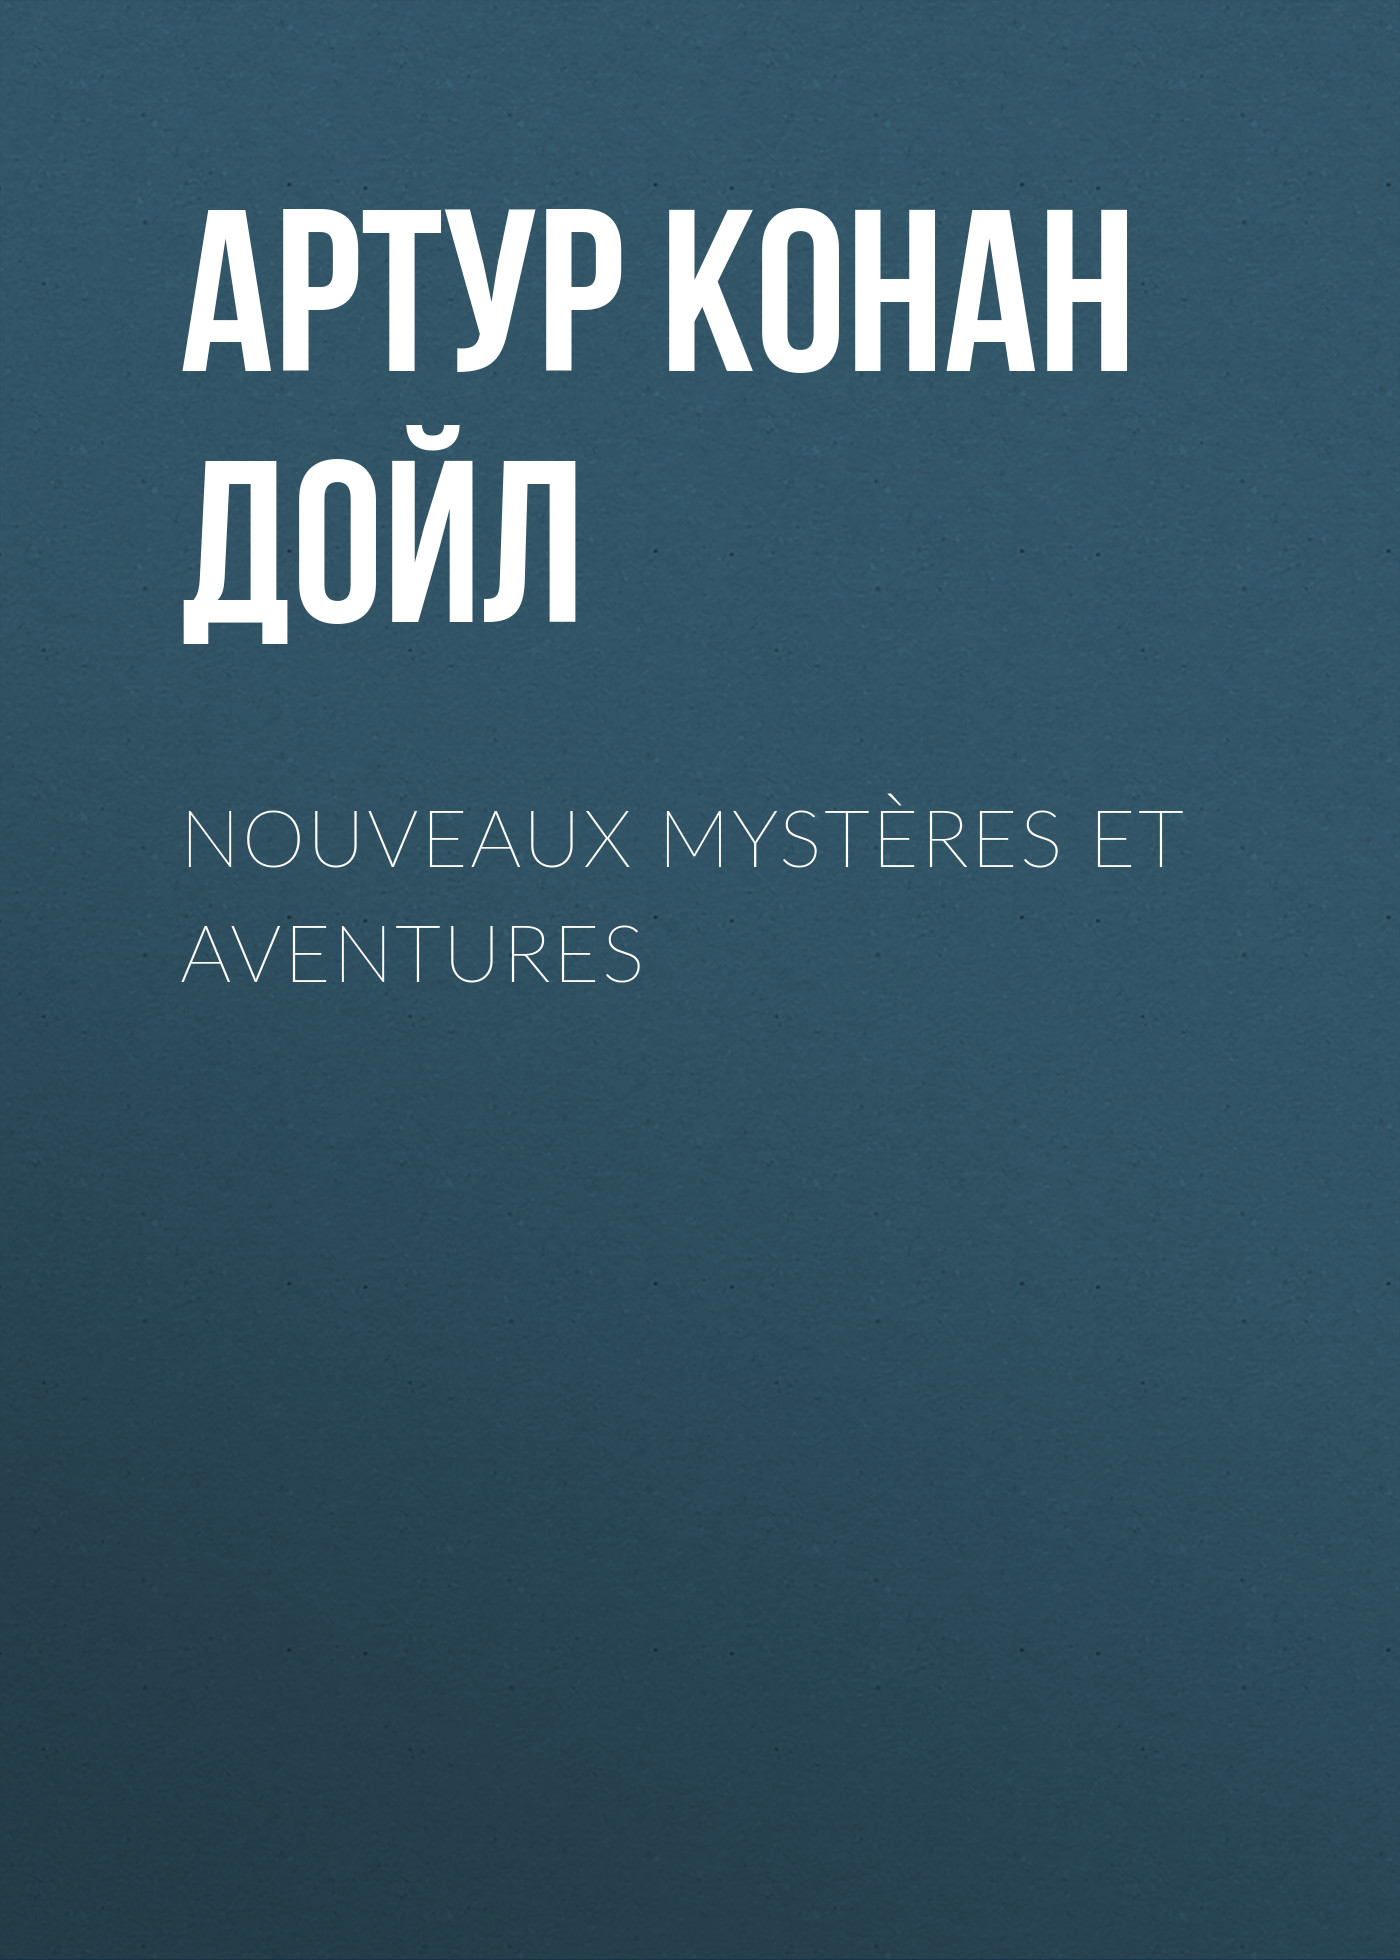 Артур Конан Дойл Nouveaux mystères et aventures артур конан дойл загадка старка манро